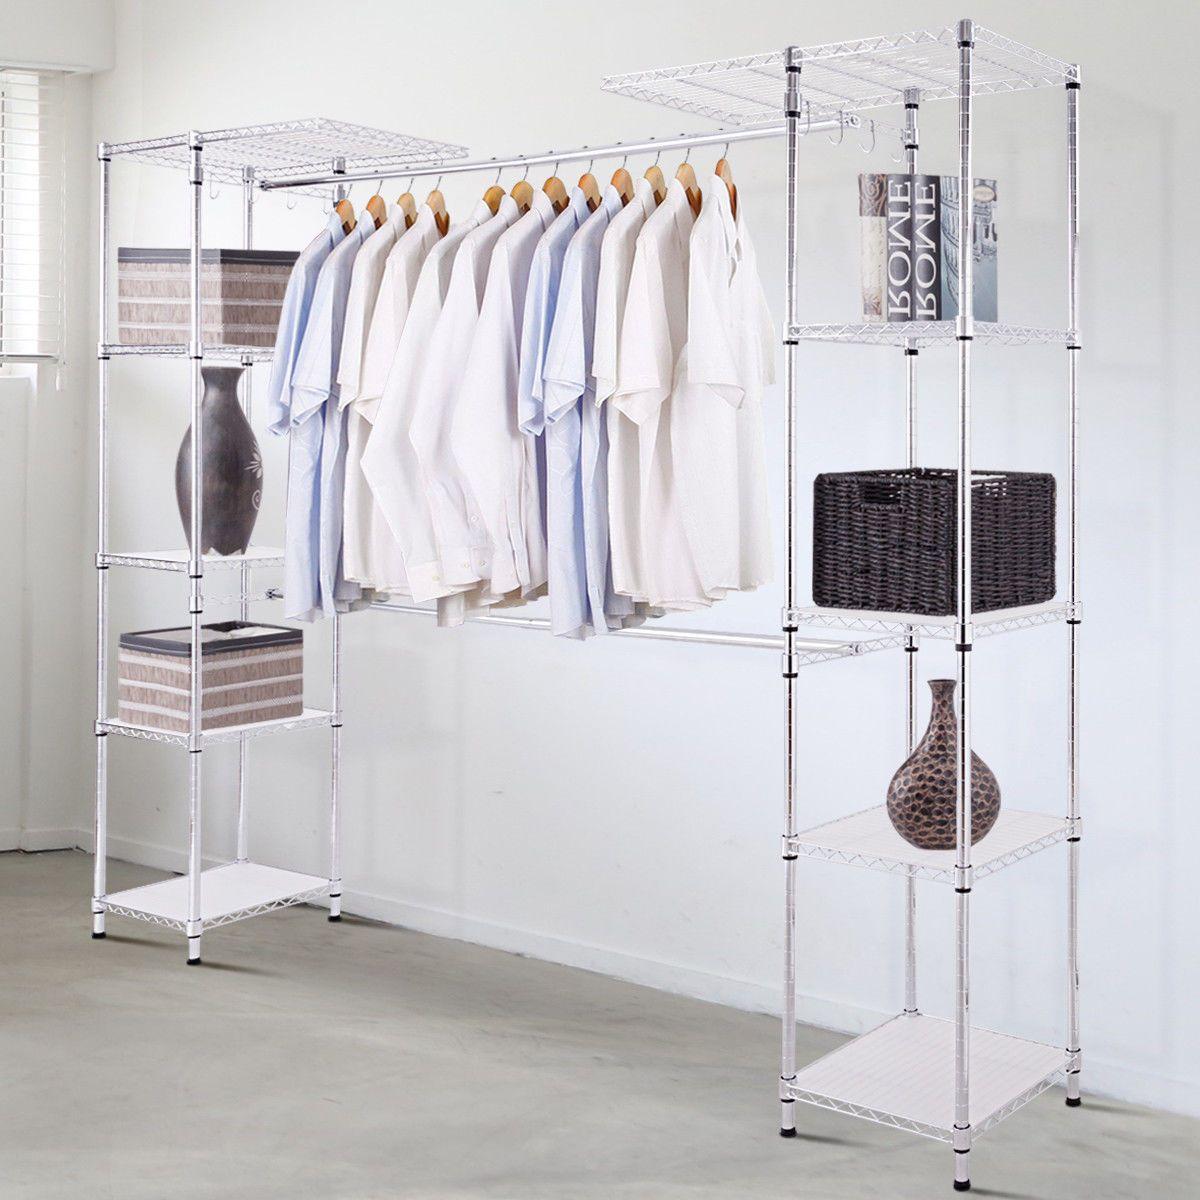 Details About Expandable Closet Organizer Free Standing Clothes